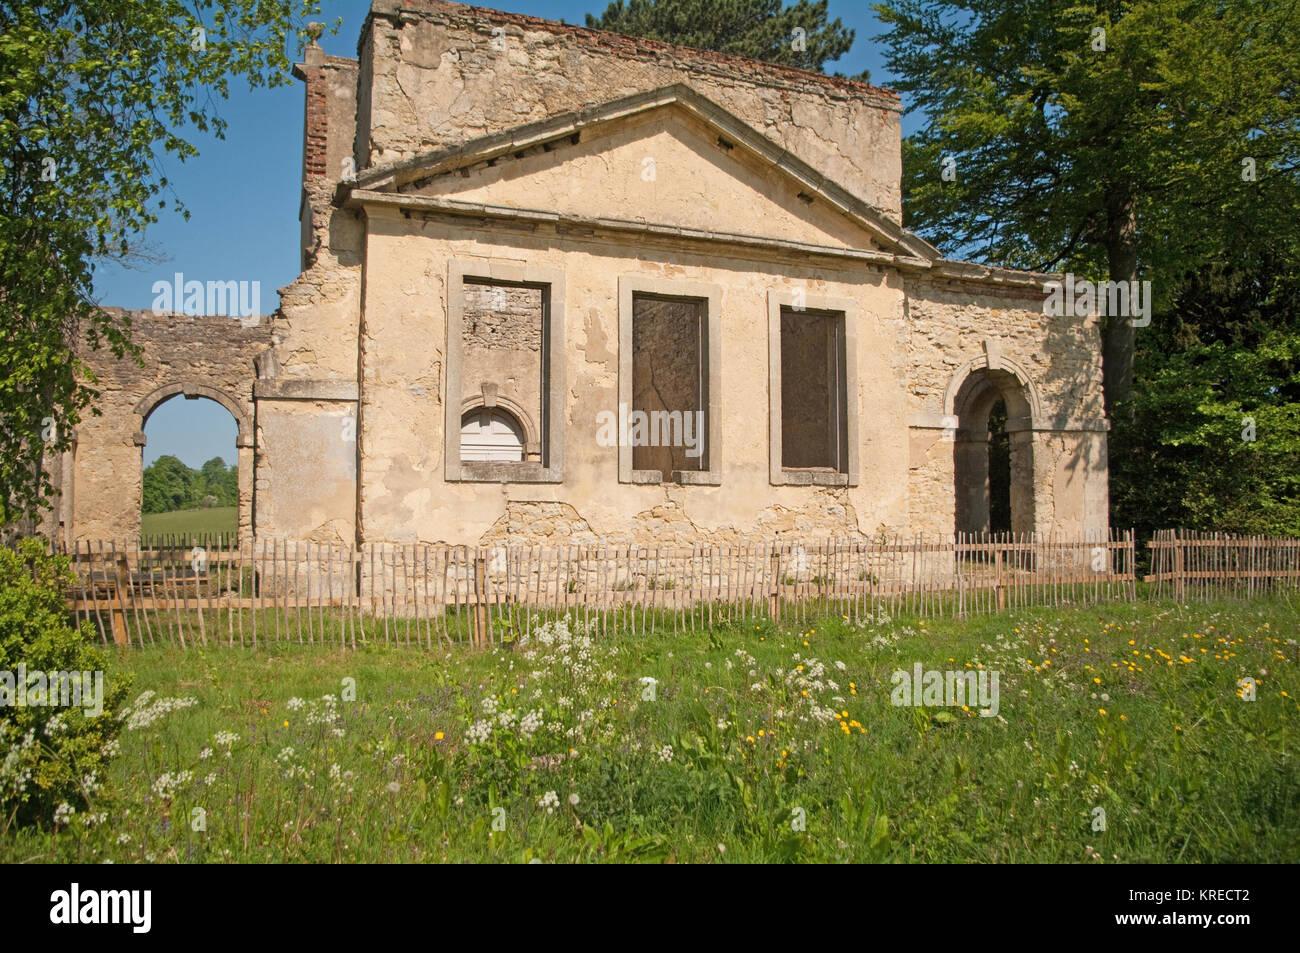 Temple of friendship stowe landscape garden buckinghamshire stock temple of friendship stowe landscape garden buckinghamshire stock photo 169347810 alamy workwithnaturefo